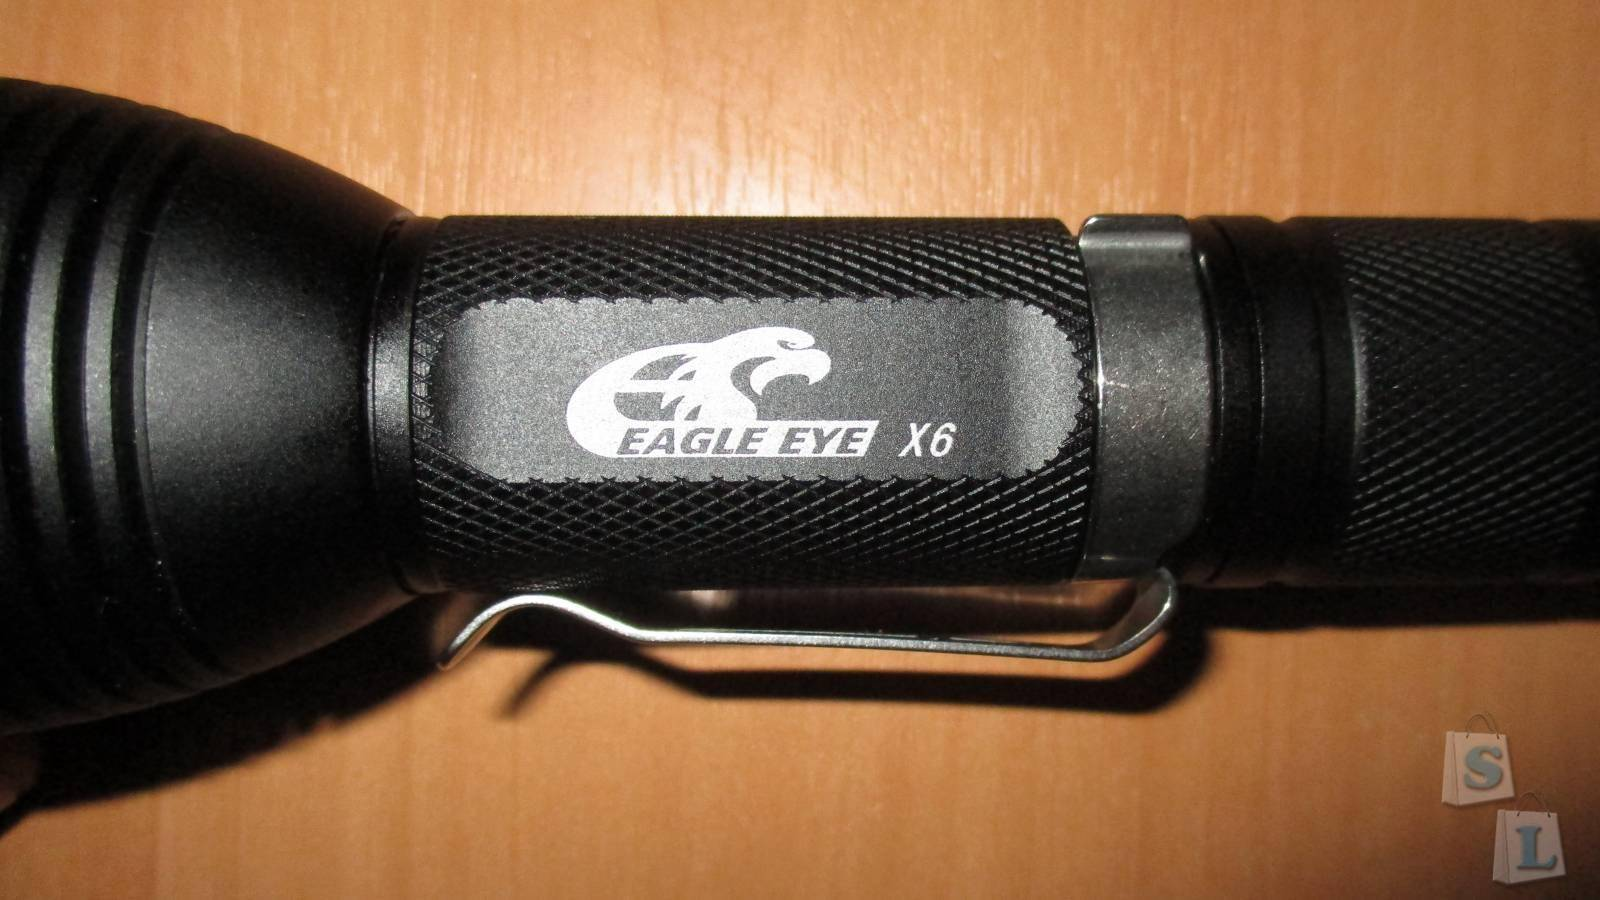 GearBest: Eagle Eye X6 Cree XPL - HI